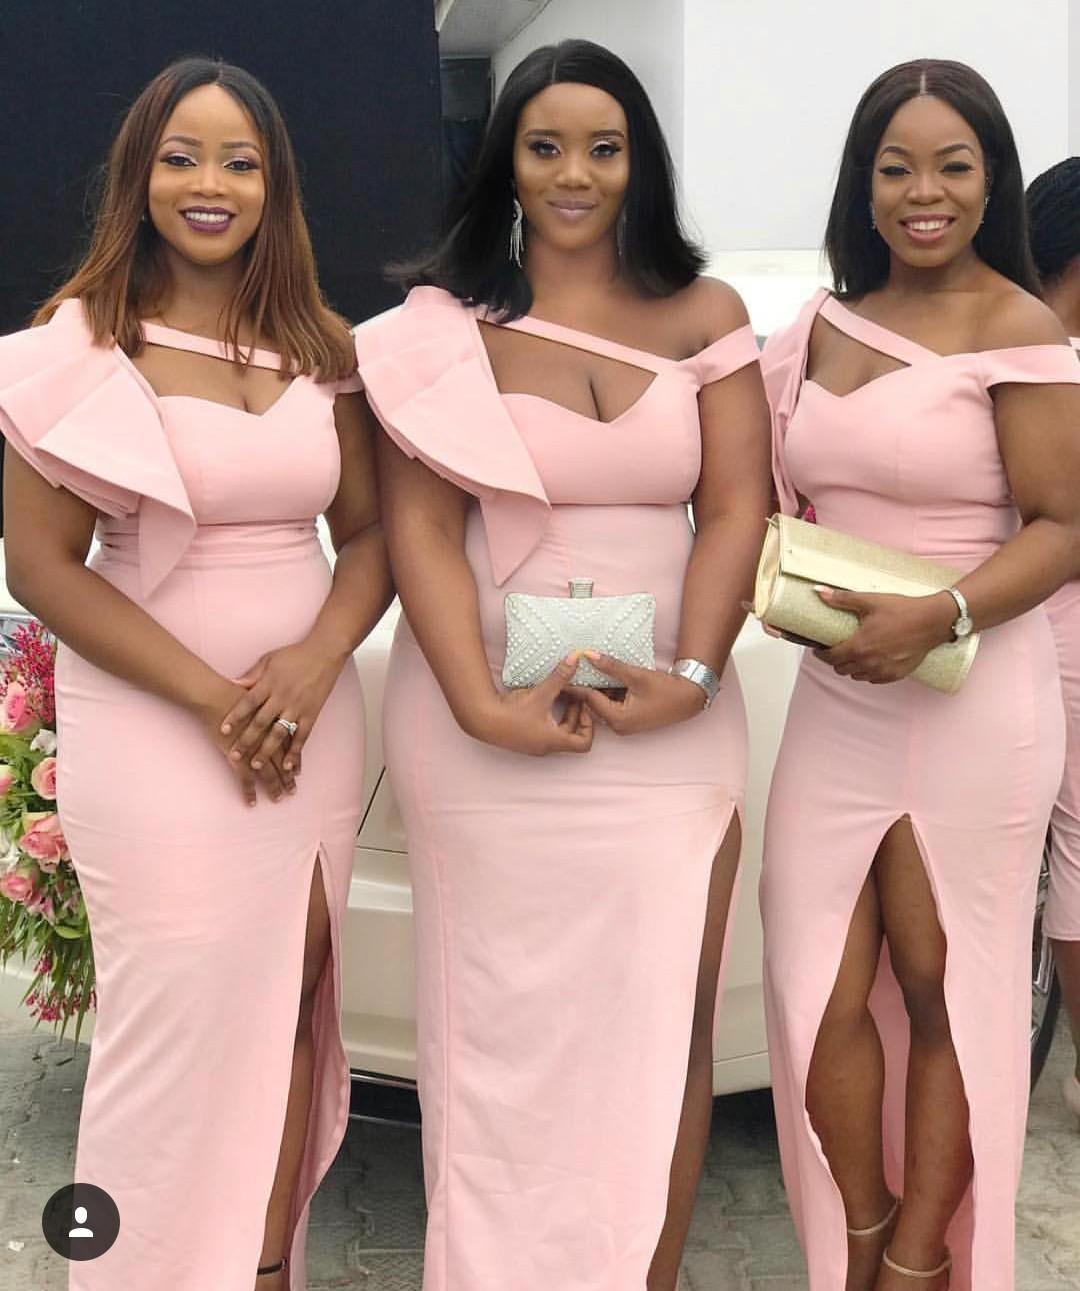 ELEGANT NIGERIAN 2020 WEDDING STYLES TO AMAZE YOUR GUESTS 2